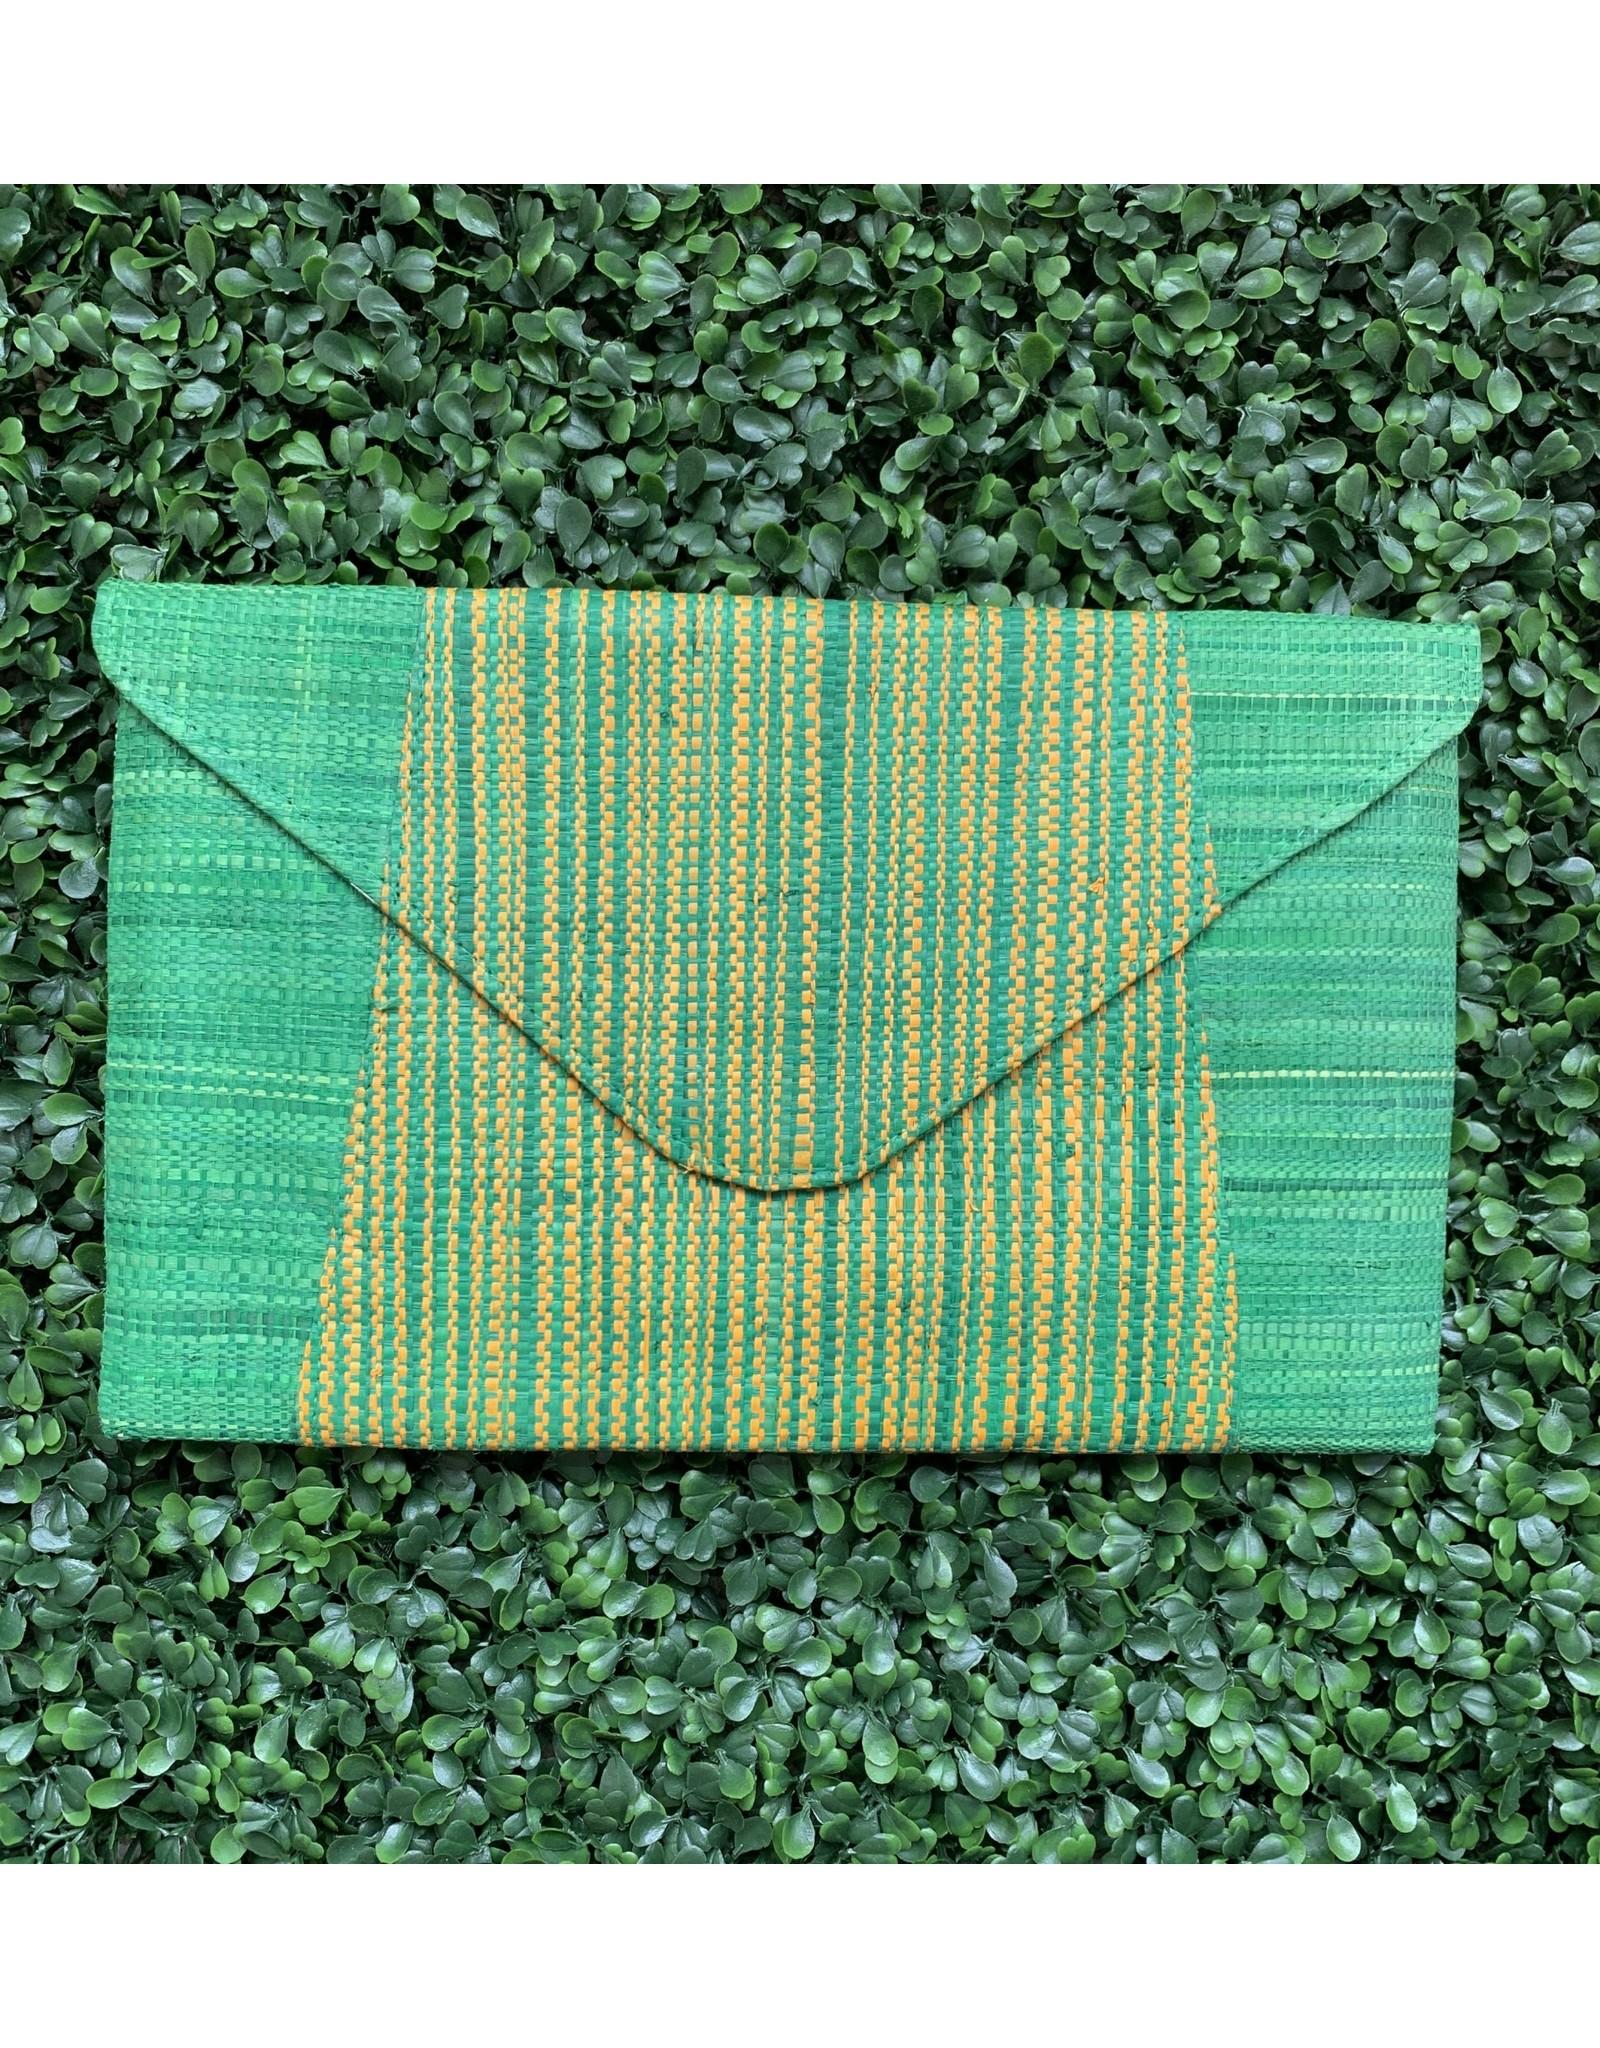 Straw Envelope Clutch in Cucumber